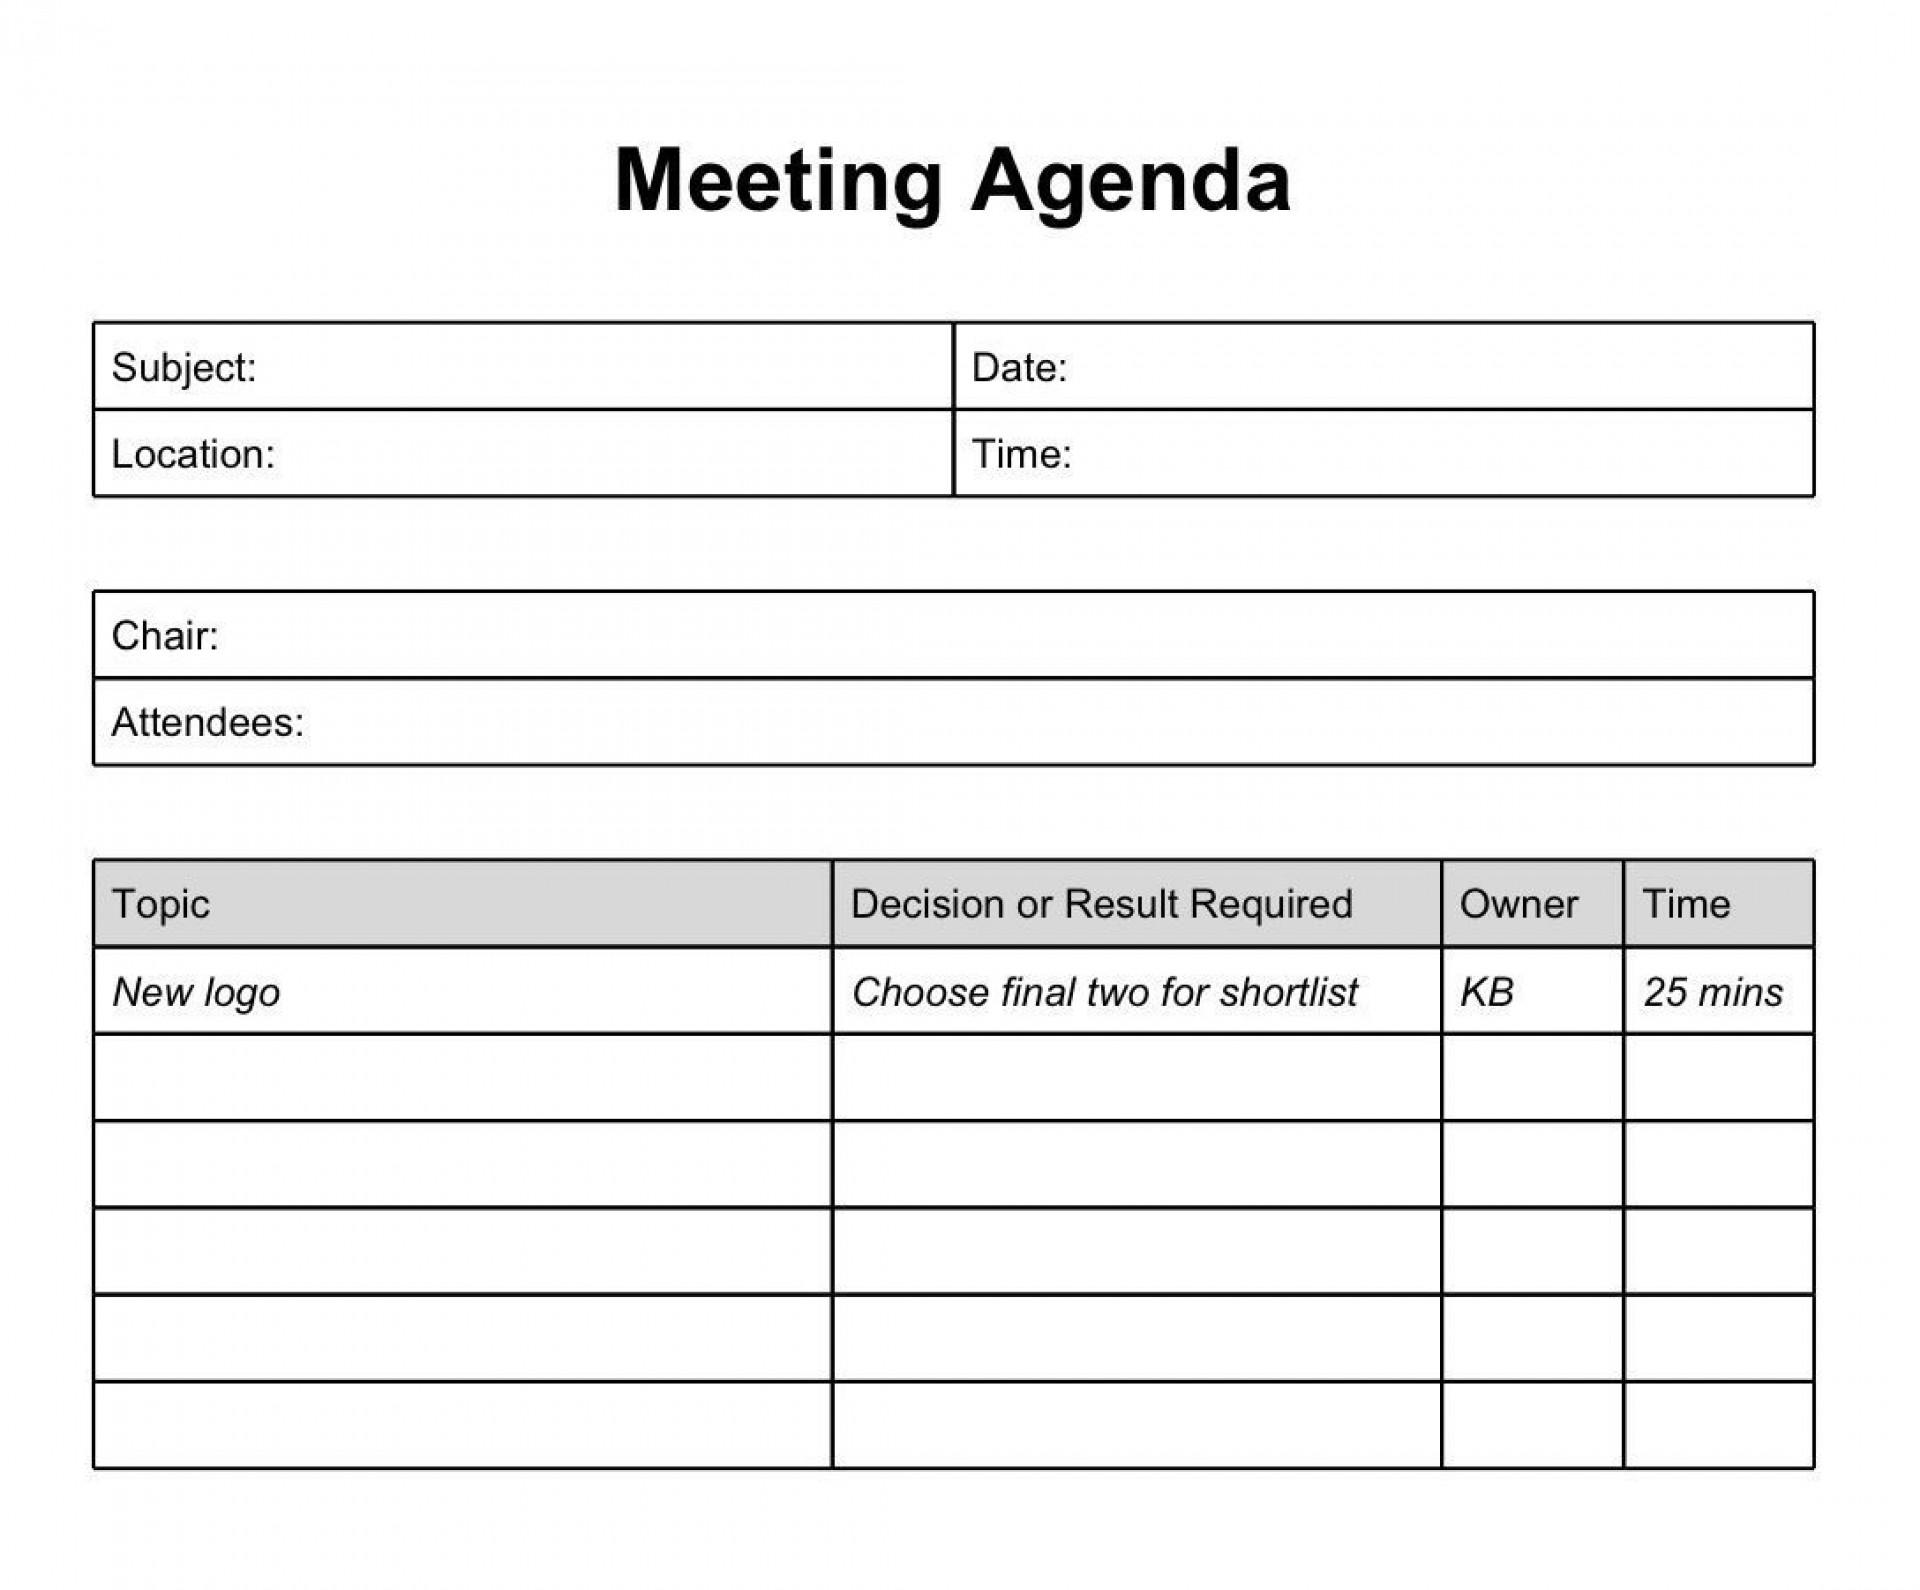 002 Unforgettable Formal Meeting Agenda Template Excel Design 1920